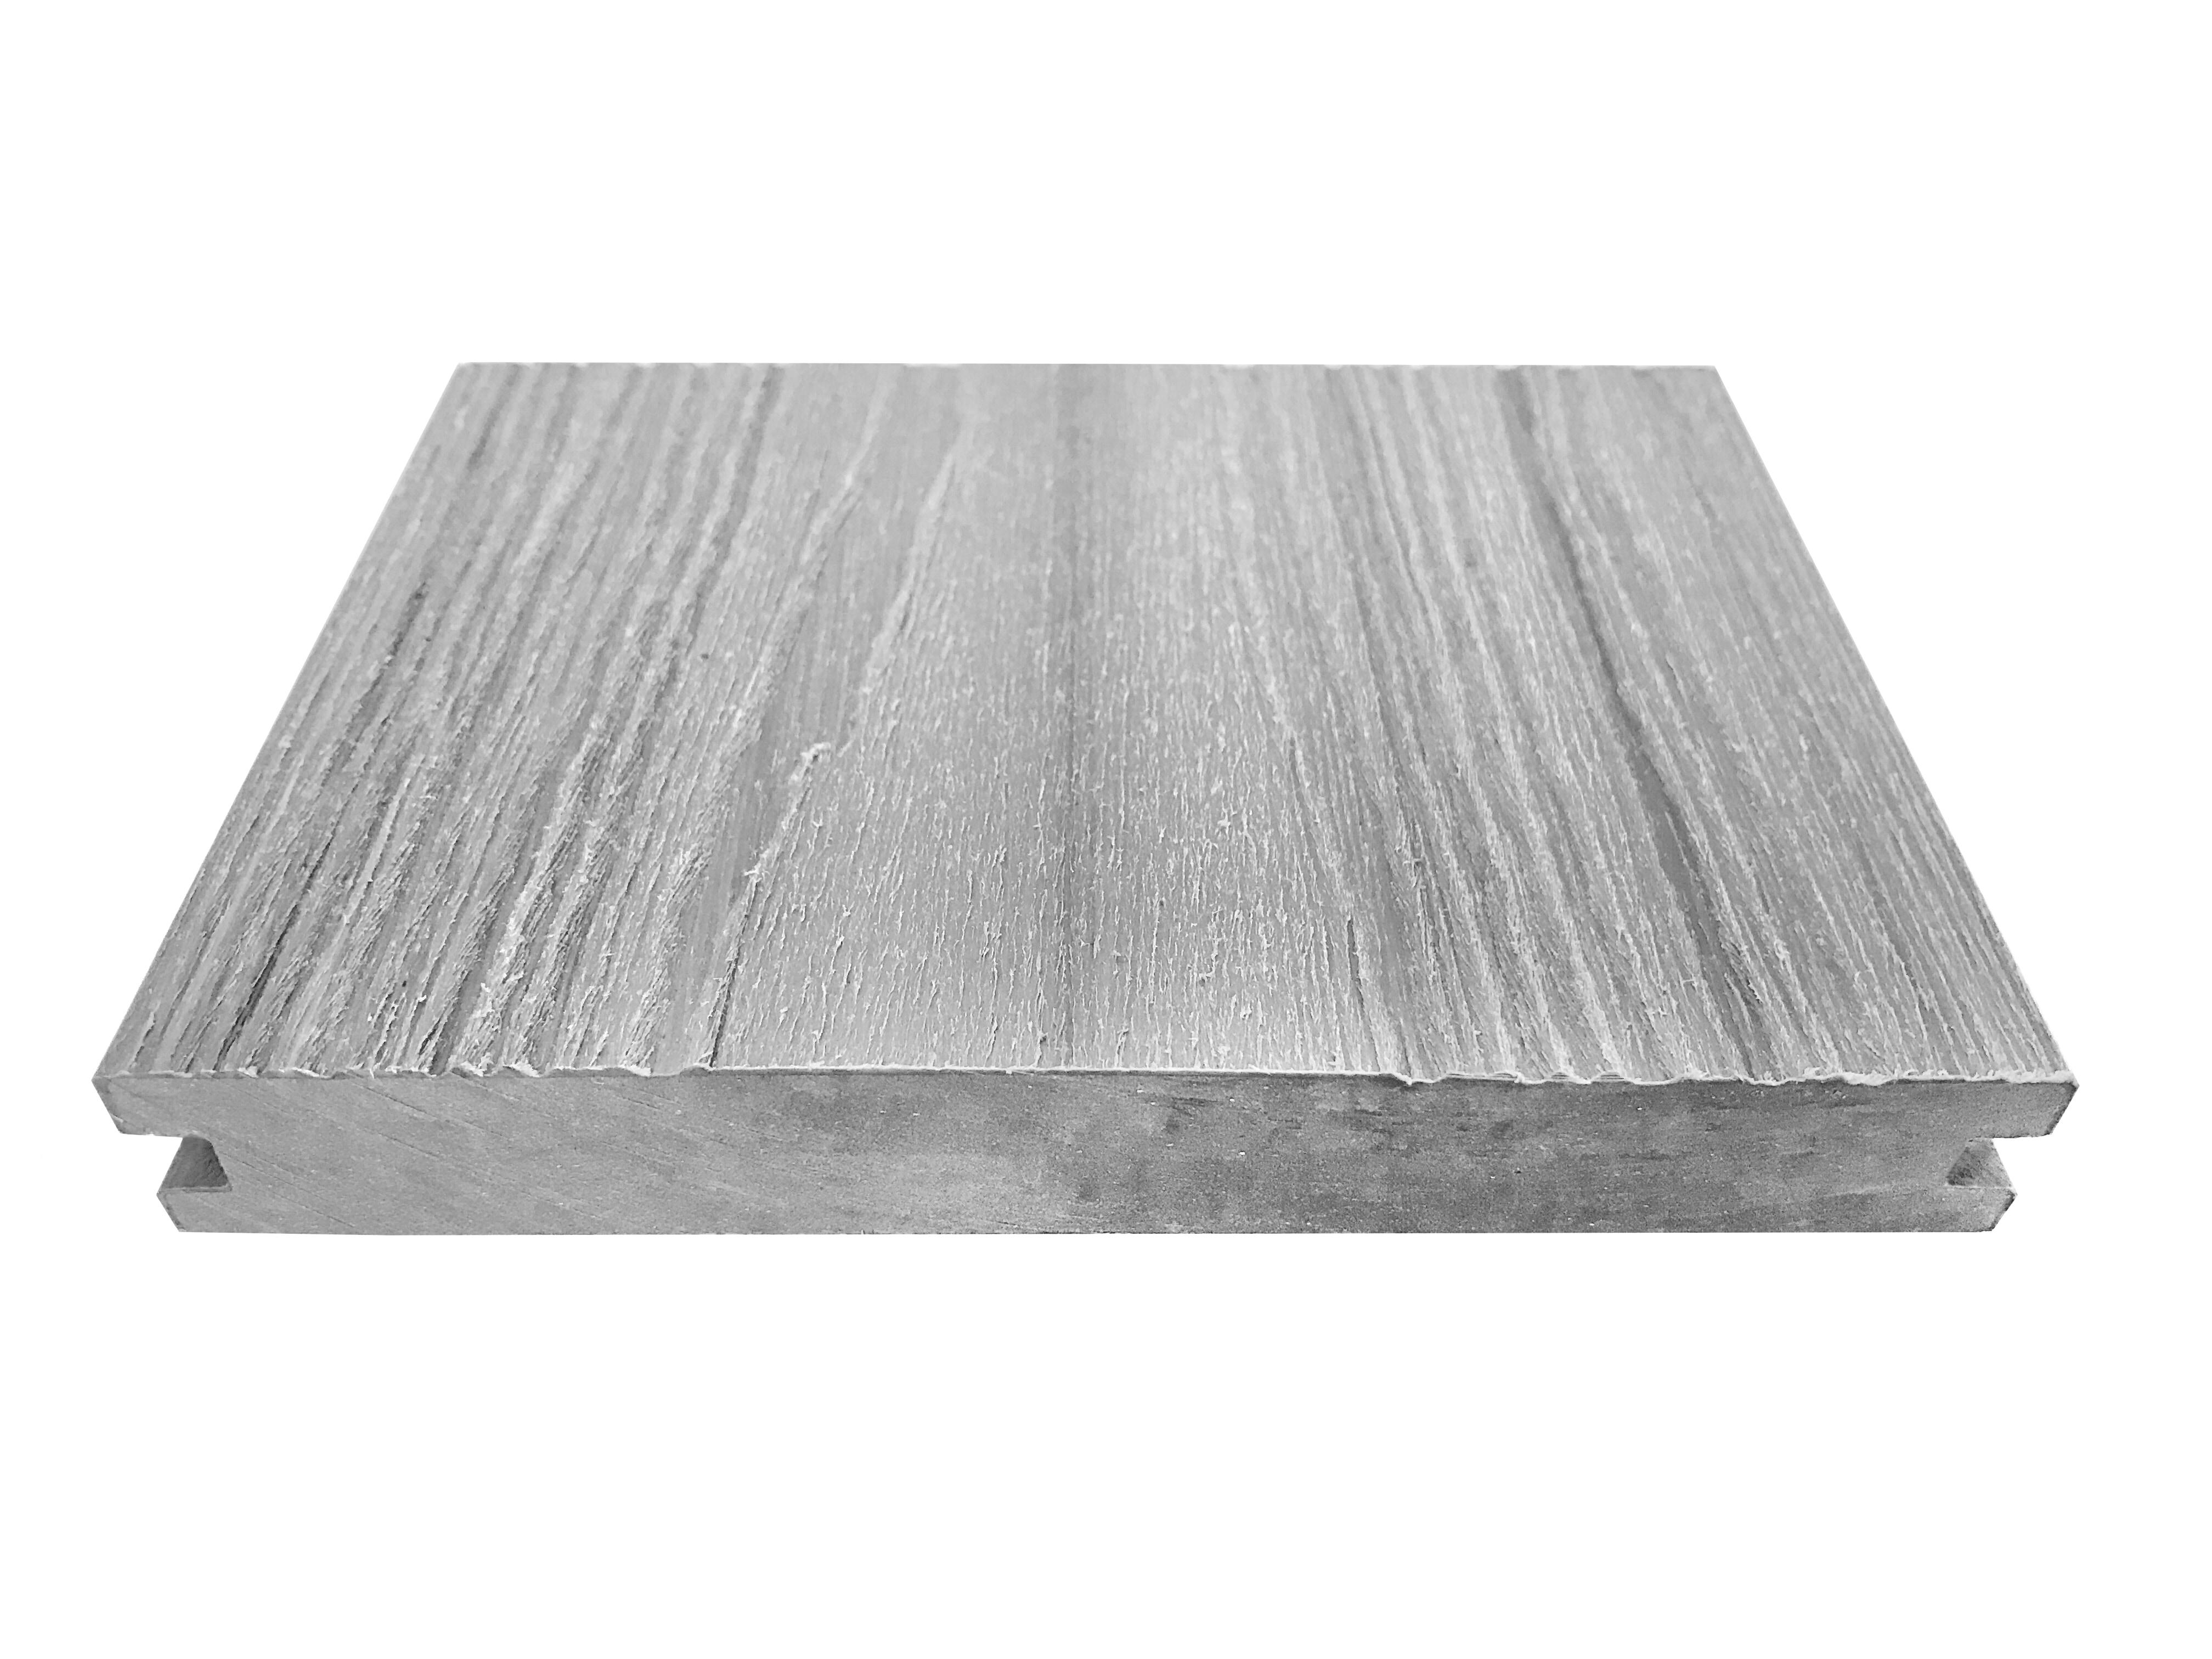 Ep decking ep wood plastic composite decking castle gray solid ep decking ep wood plastic composite decking castle gray solid grooved wood grain 5 12x 34x12 baanklon Images